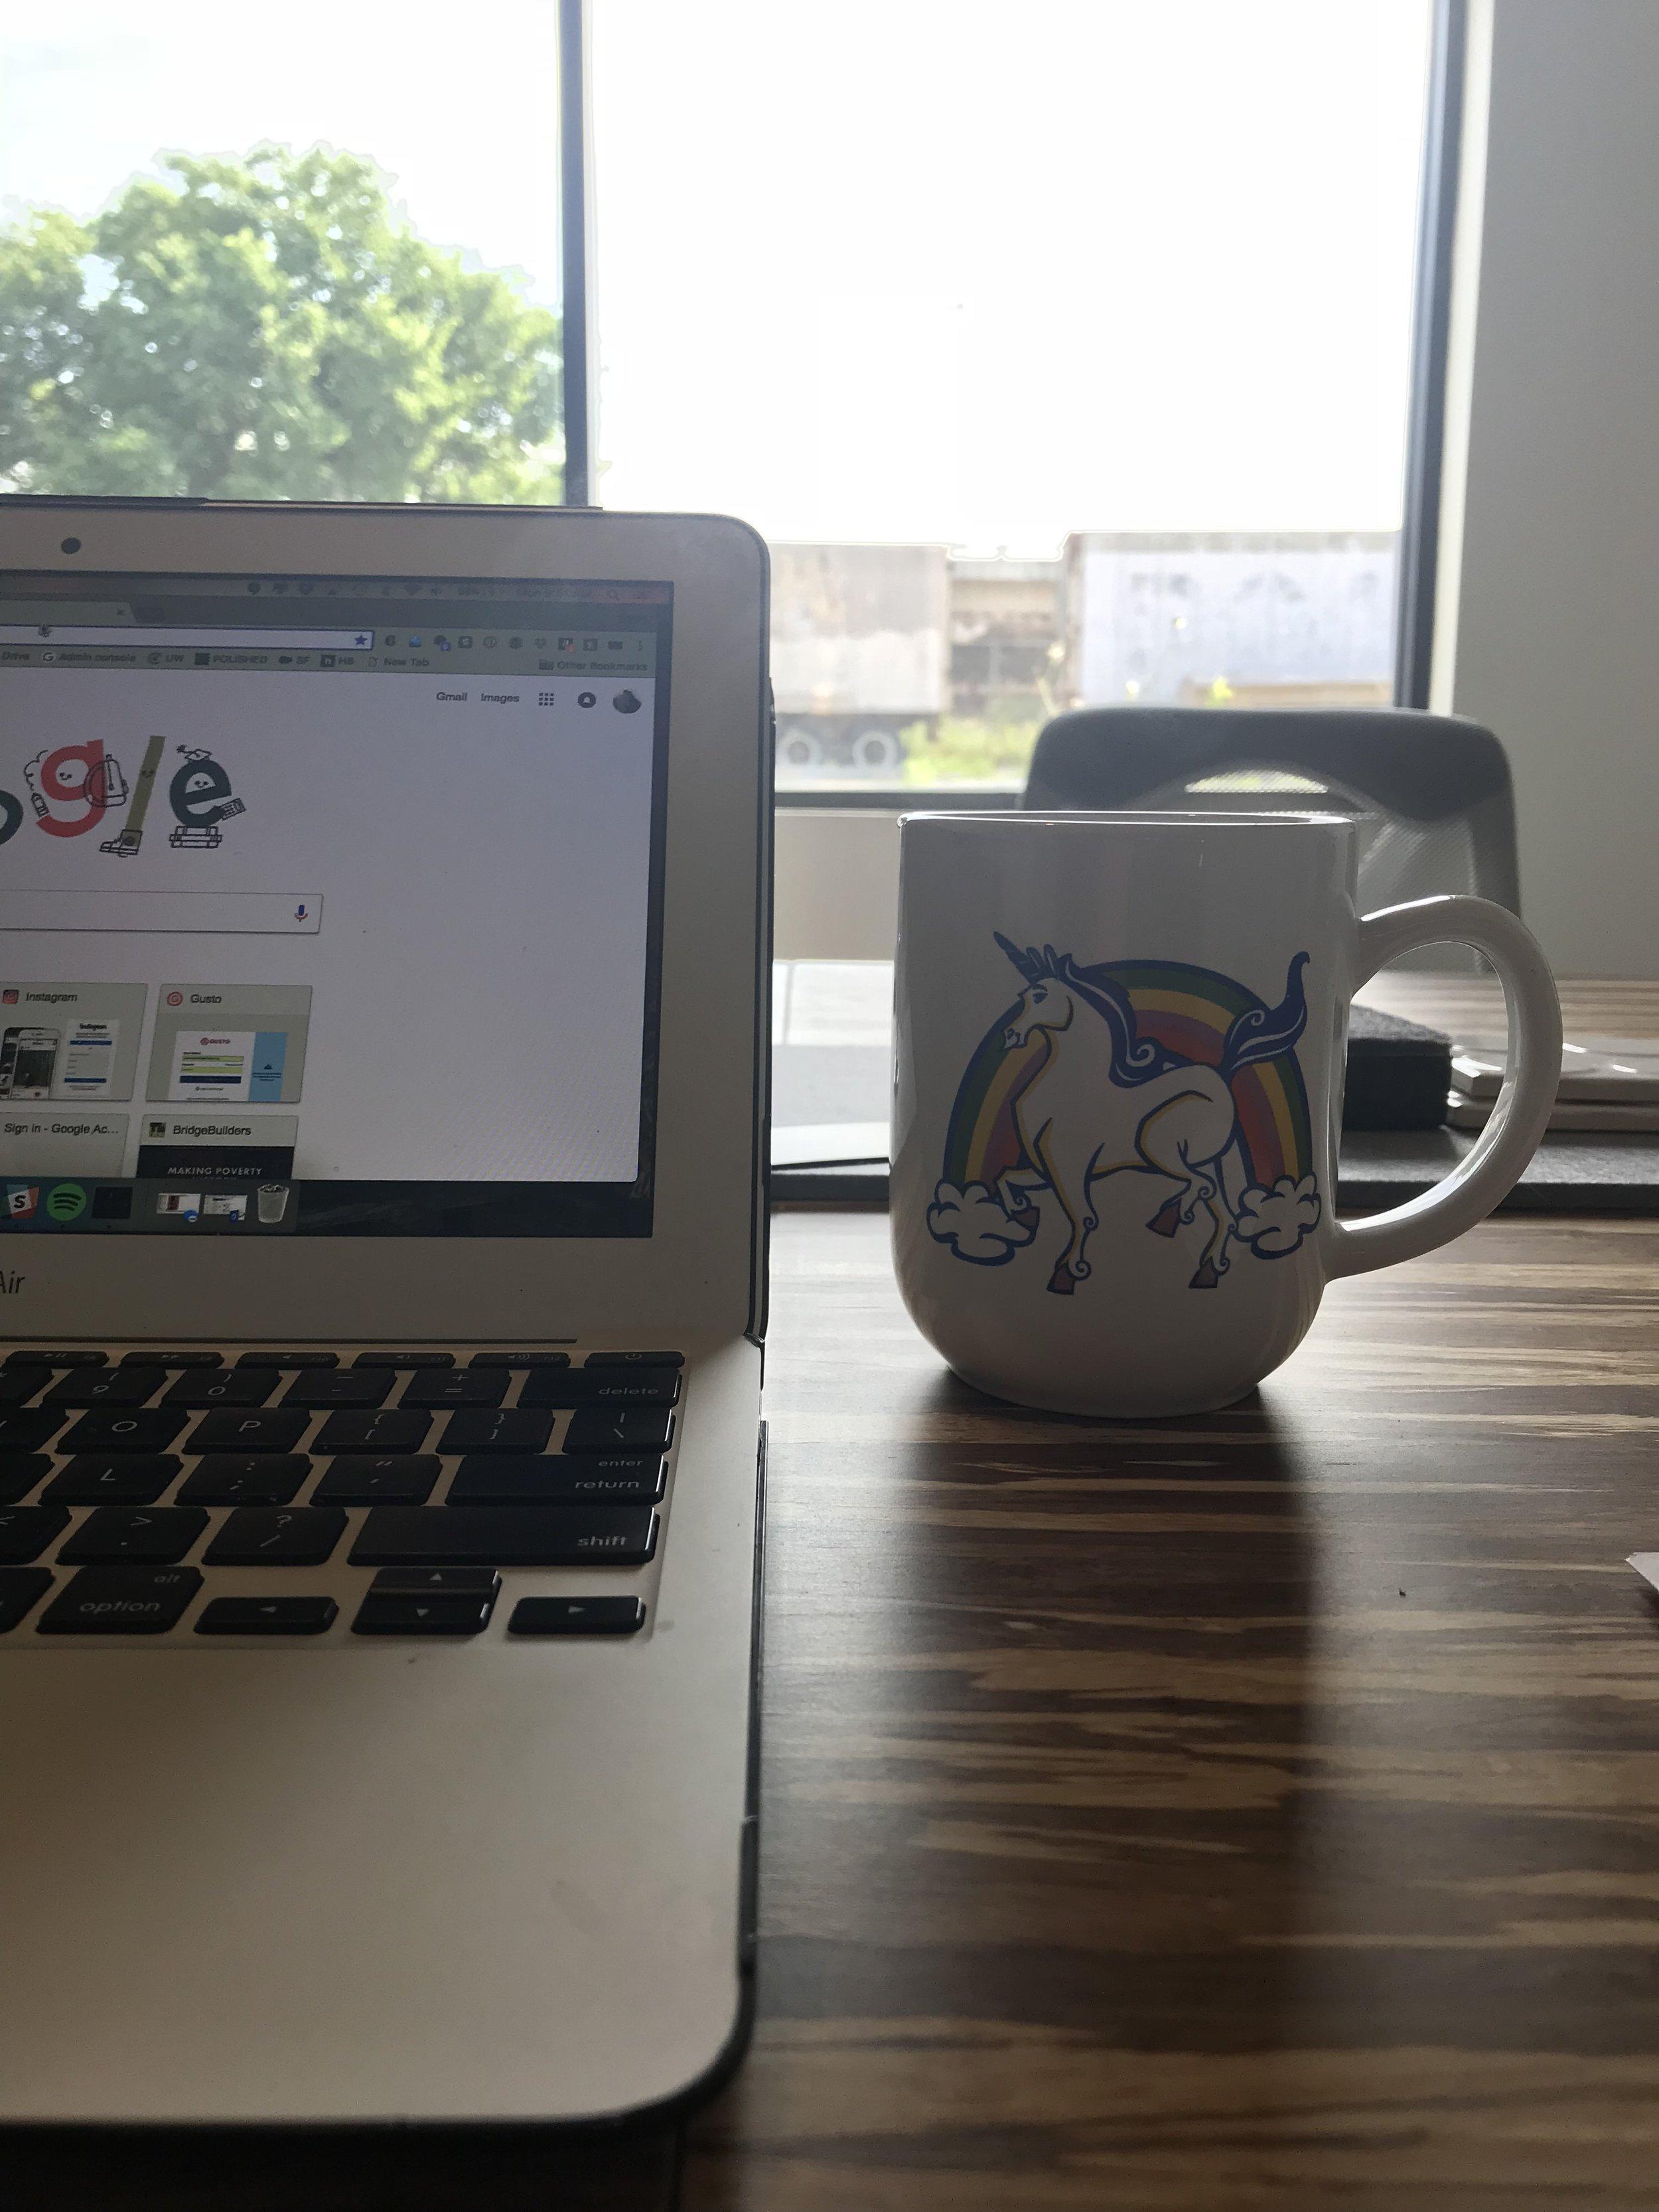 Sunshine, unlimited coffee, and a unicorn mug makes our Development Director, Sarah Conner, one happy BridgeBuilder.